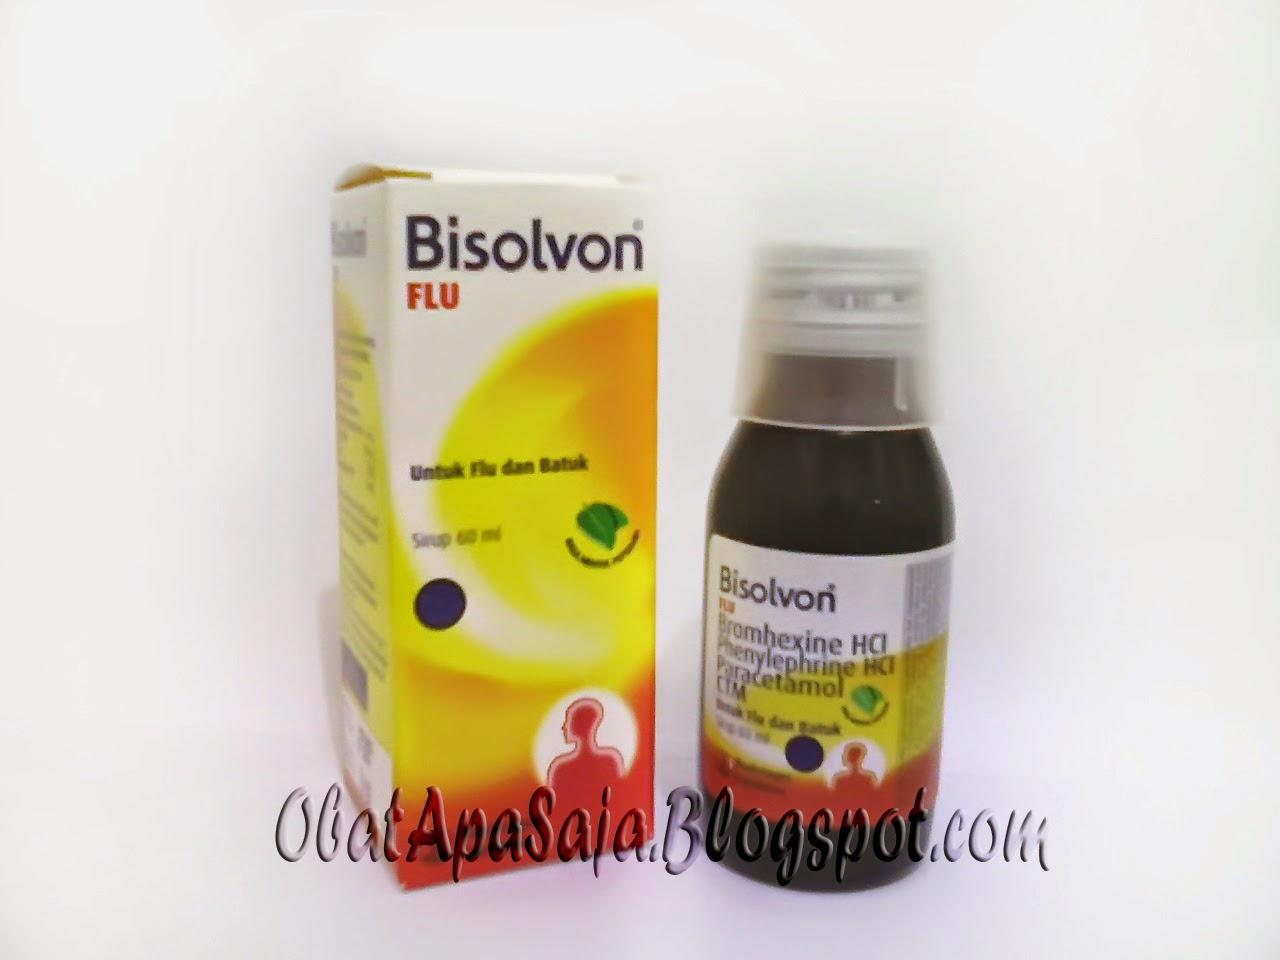 Bisolvon Flu untuk Meringankan Gejala Flu